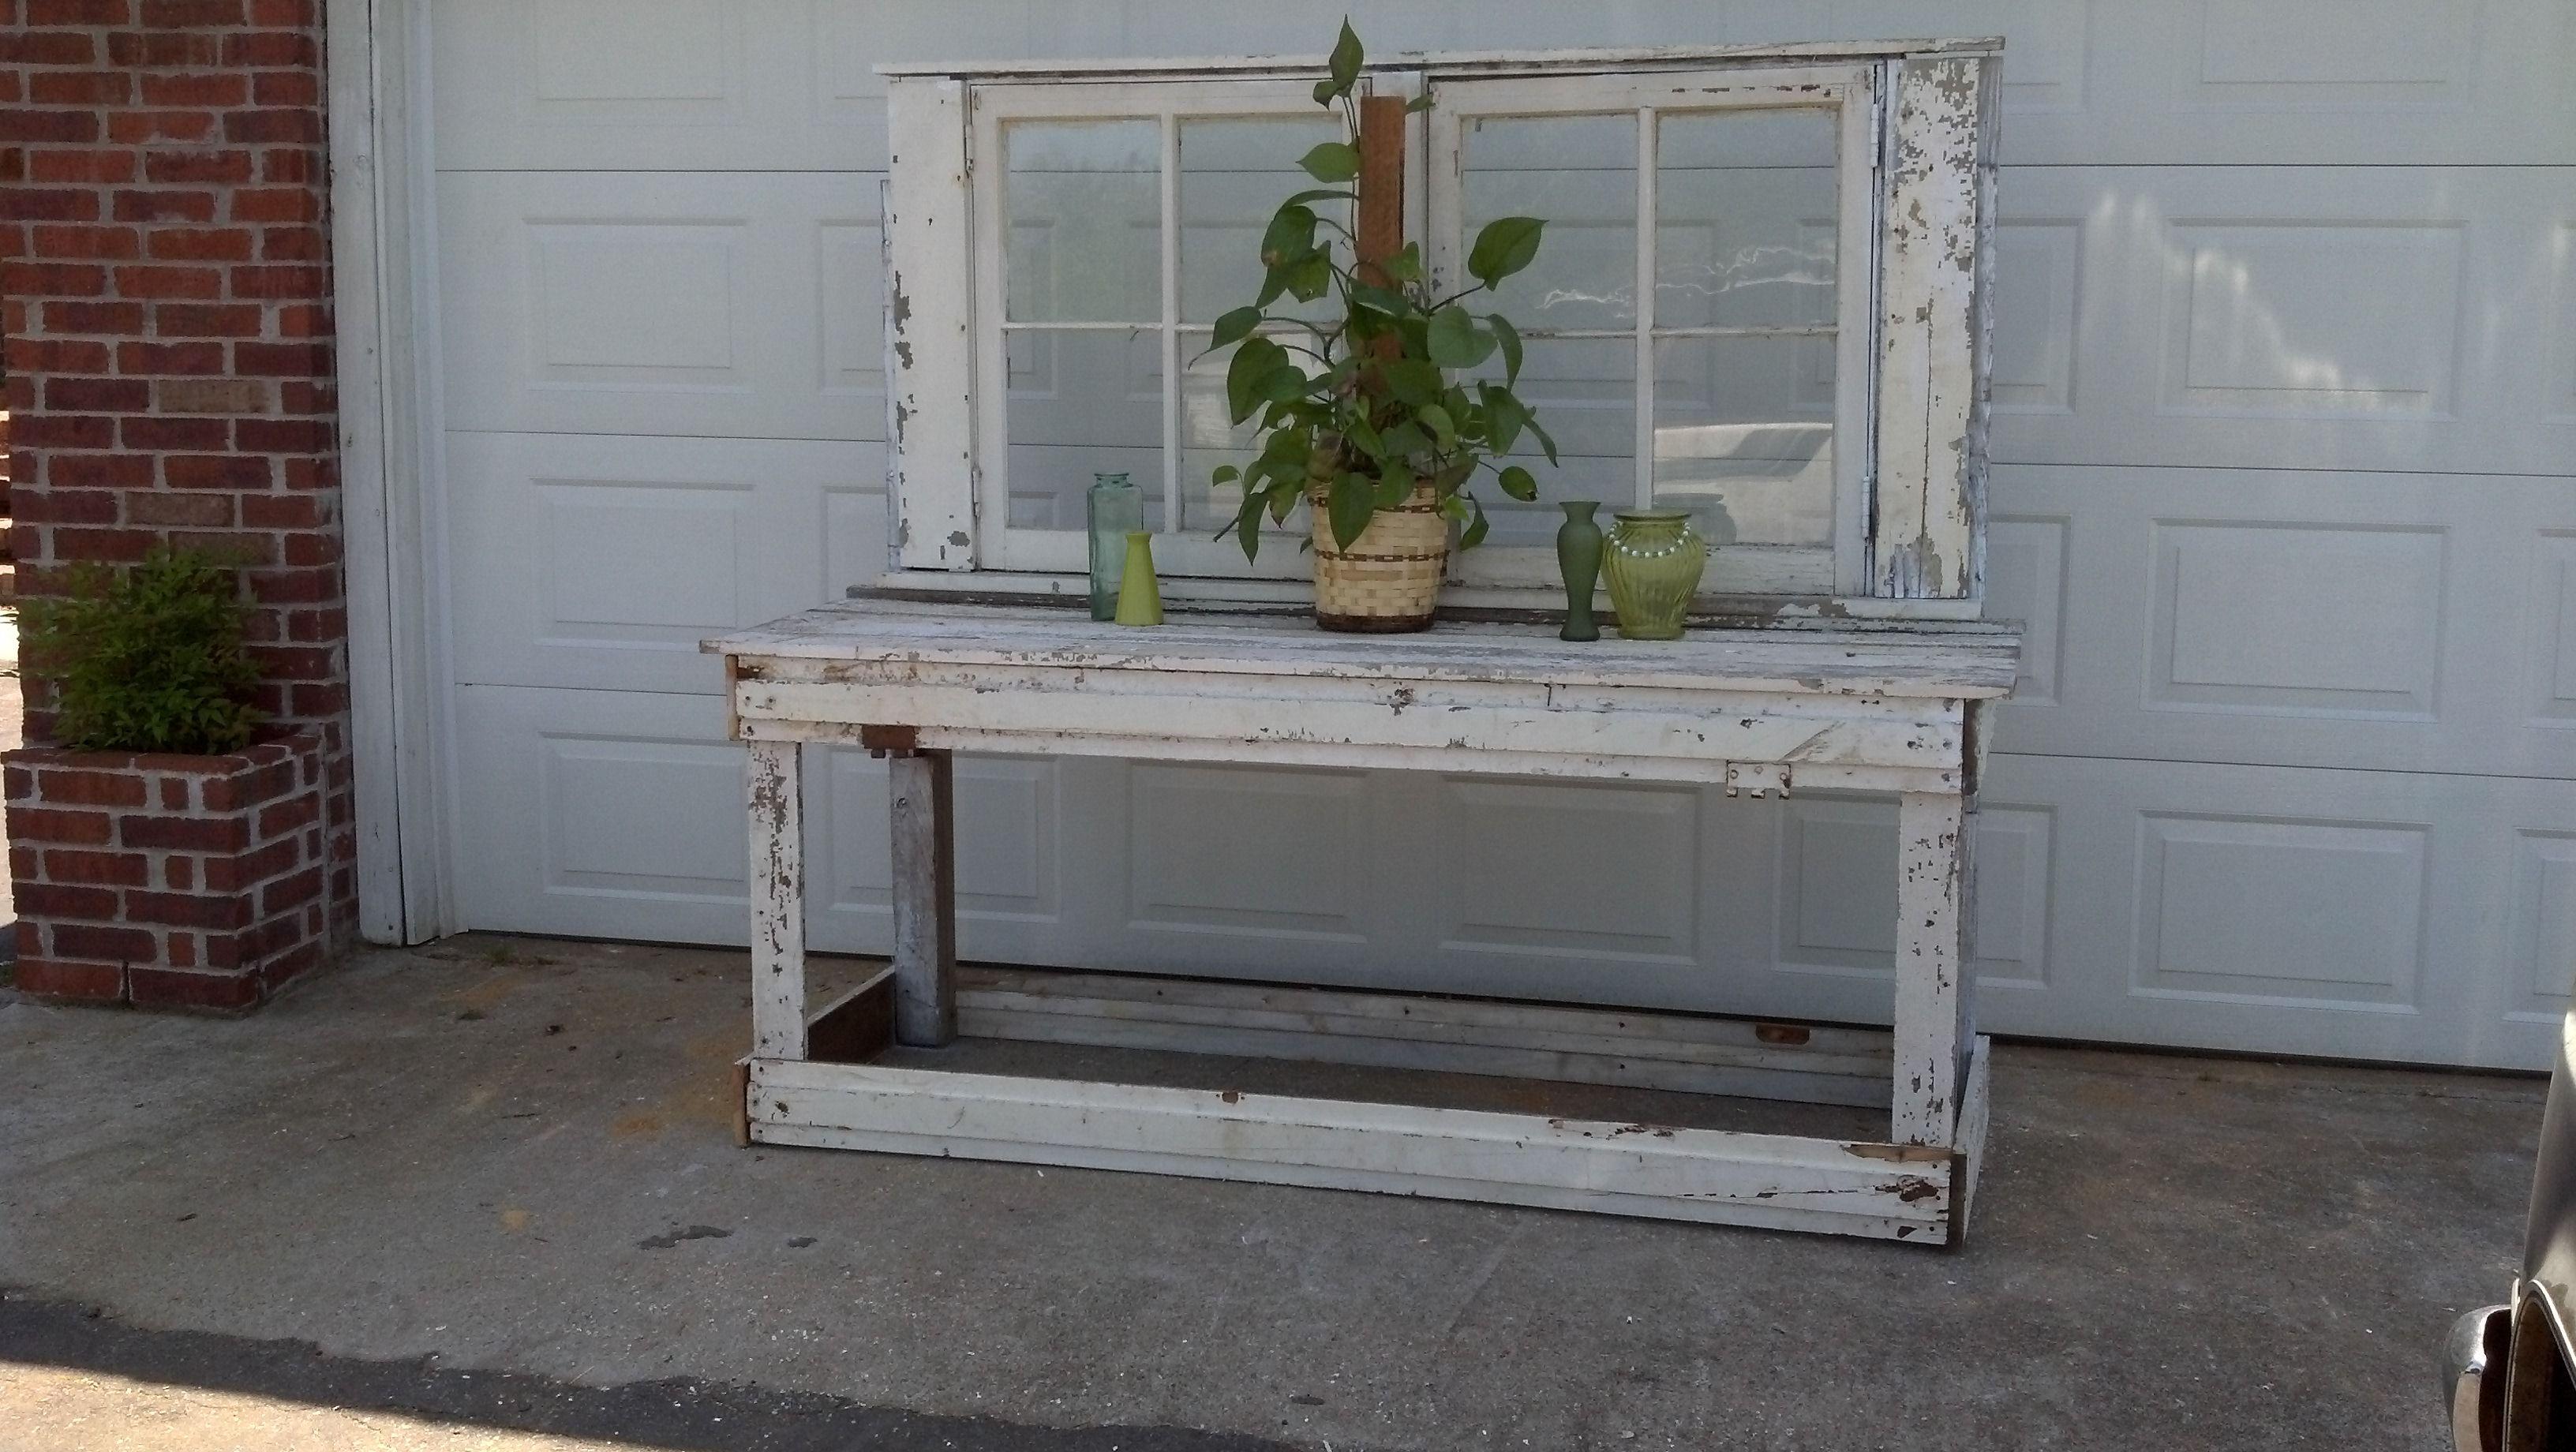 Pin by Misty Johnson on Repurposing Furniture Ideas | Pinterest